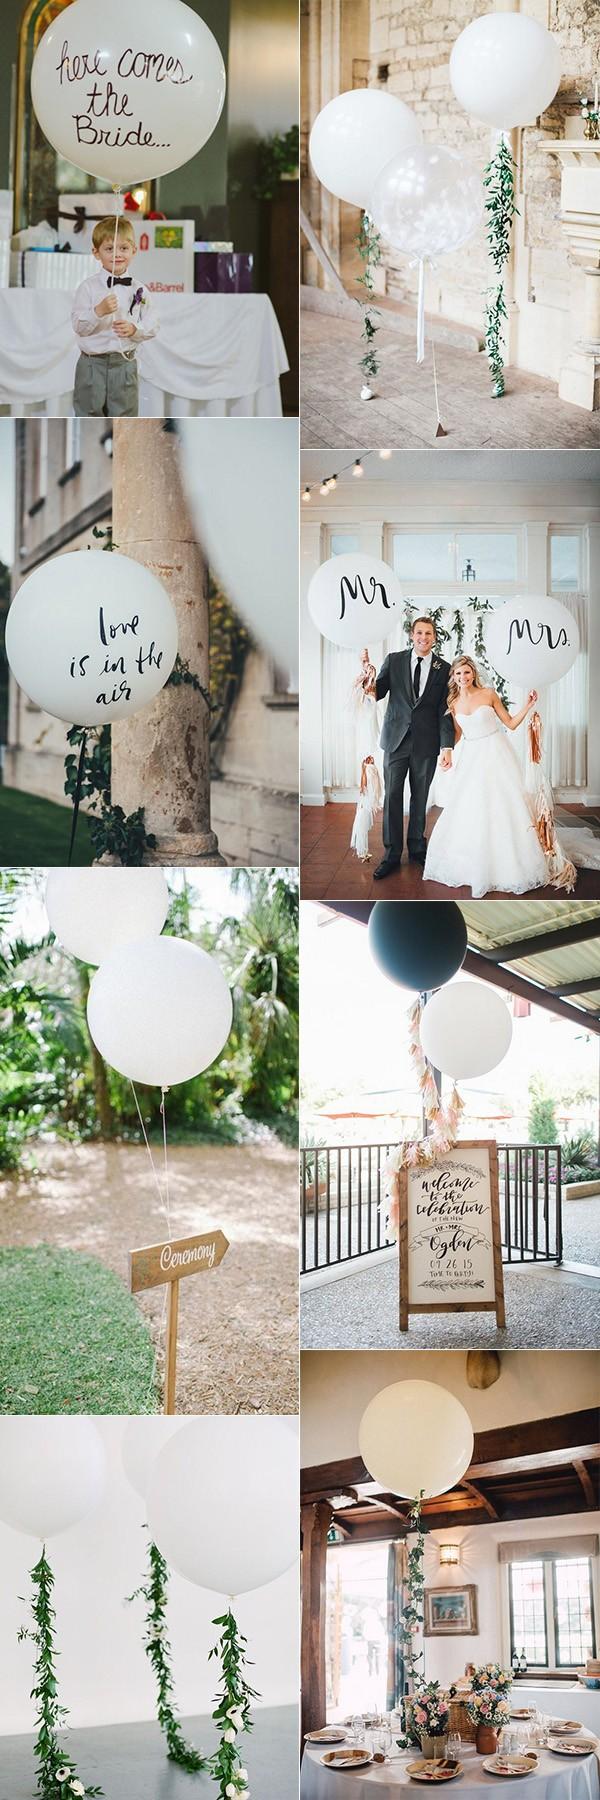 trending balloon wedding decoration ideas